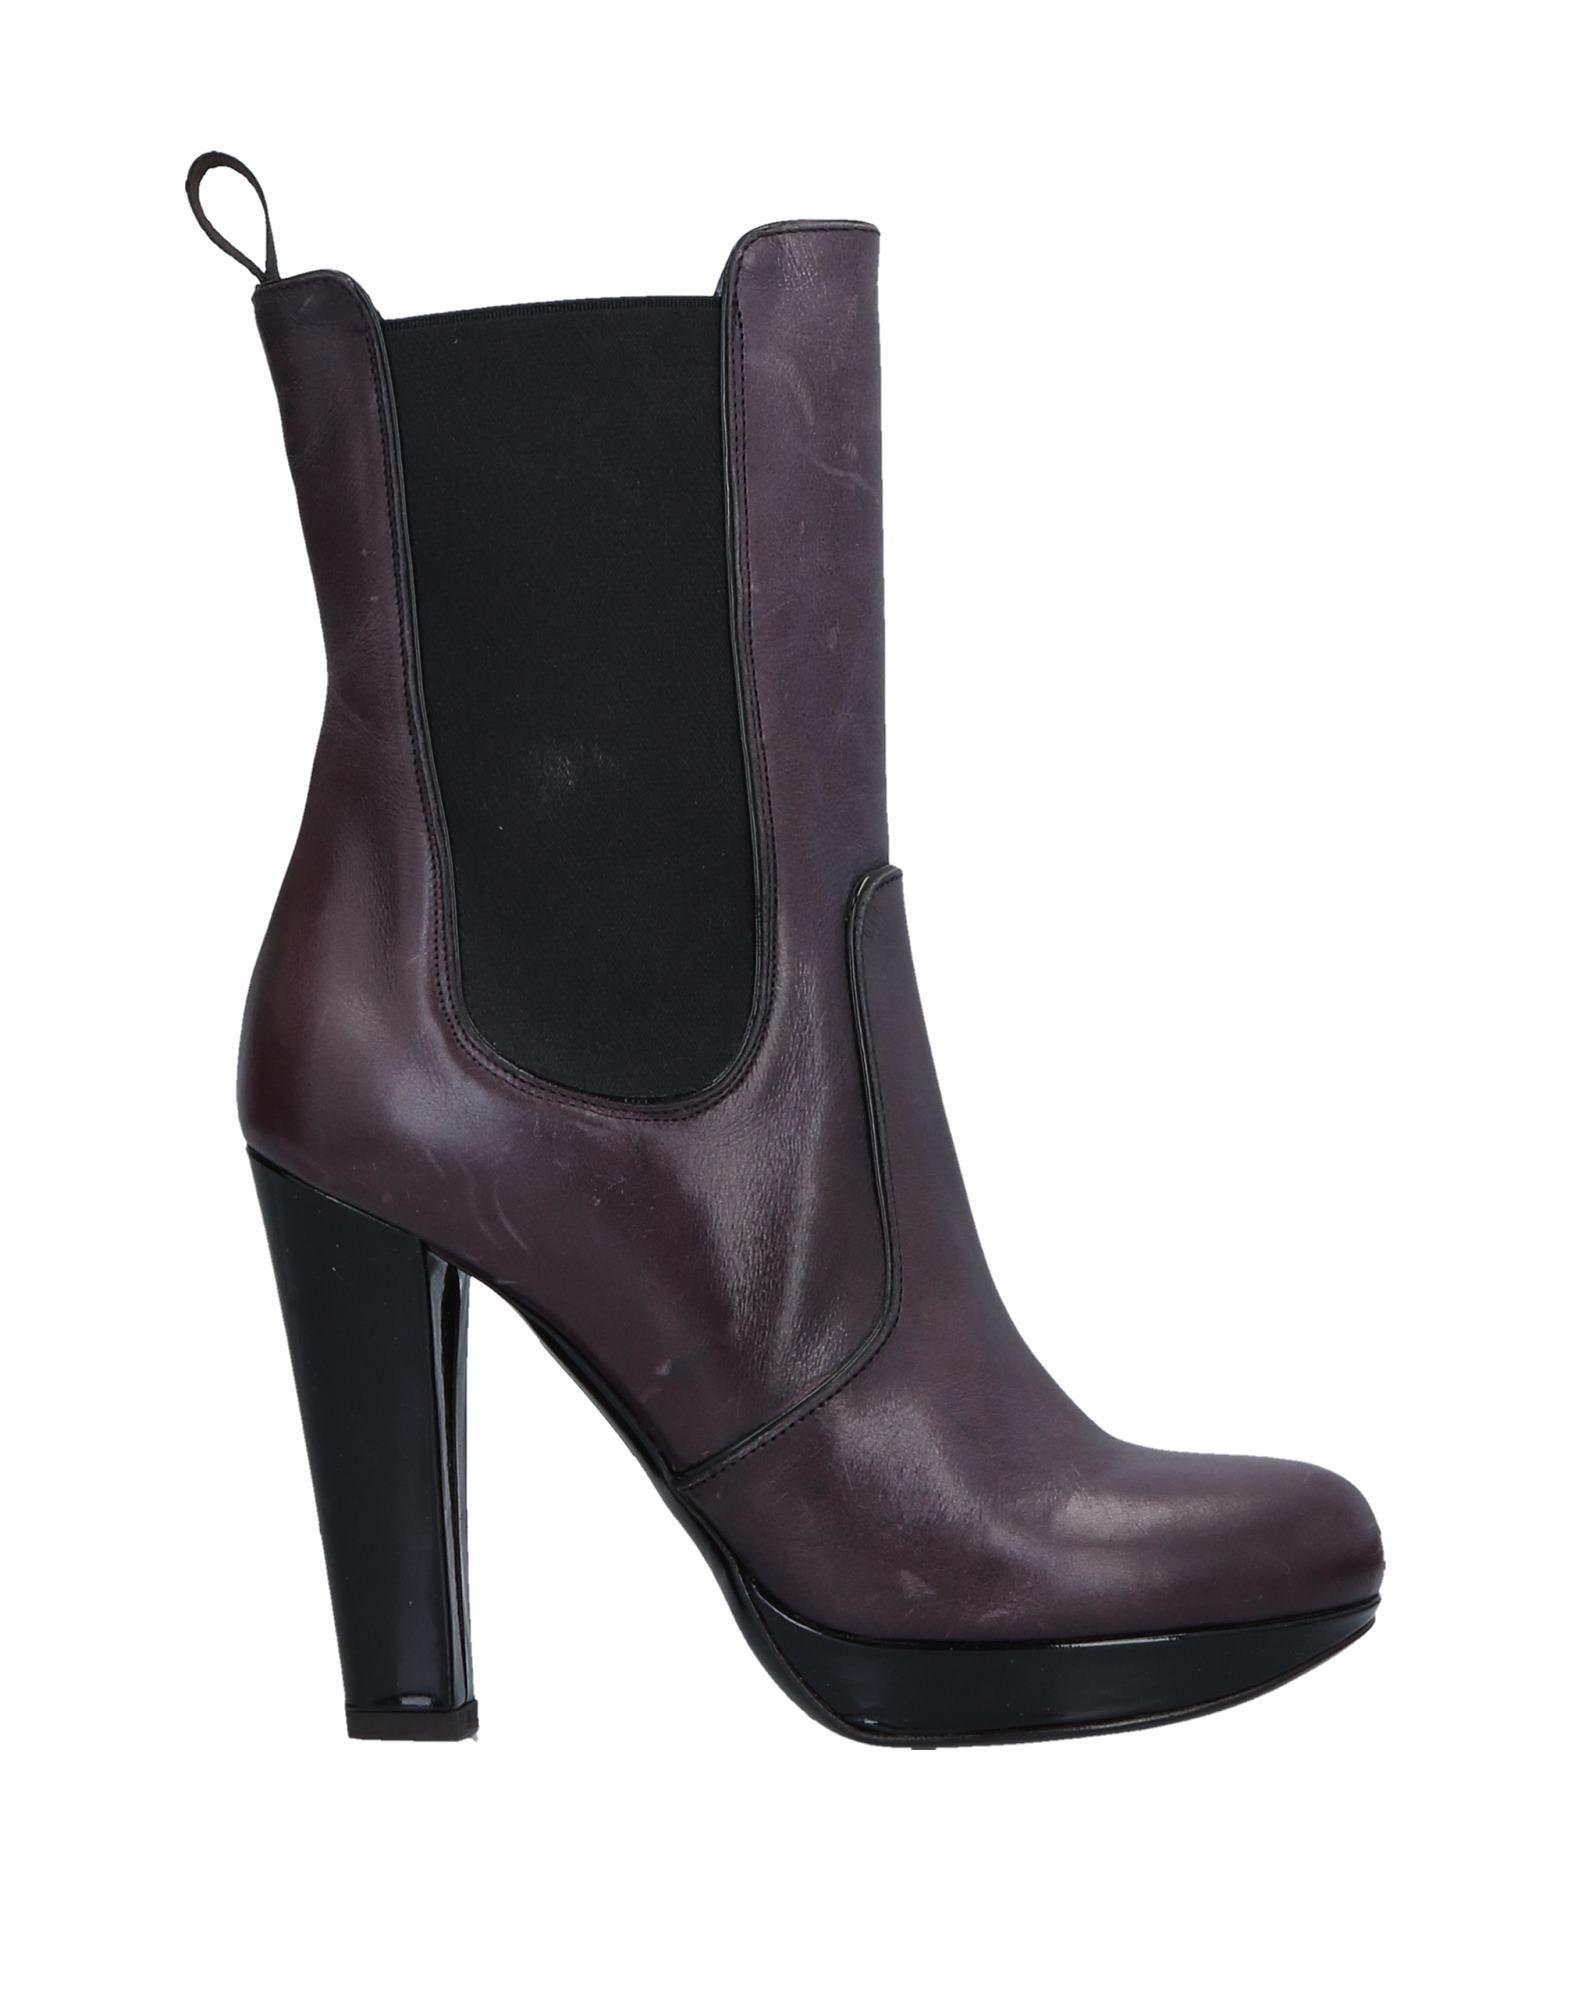 STUDIO POLLINI Полусапоги и высокие ботинки pollini полусапоги и высокие ботинки